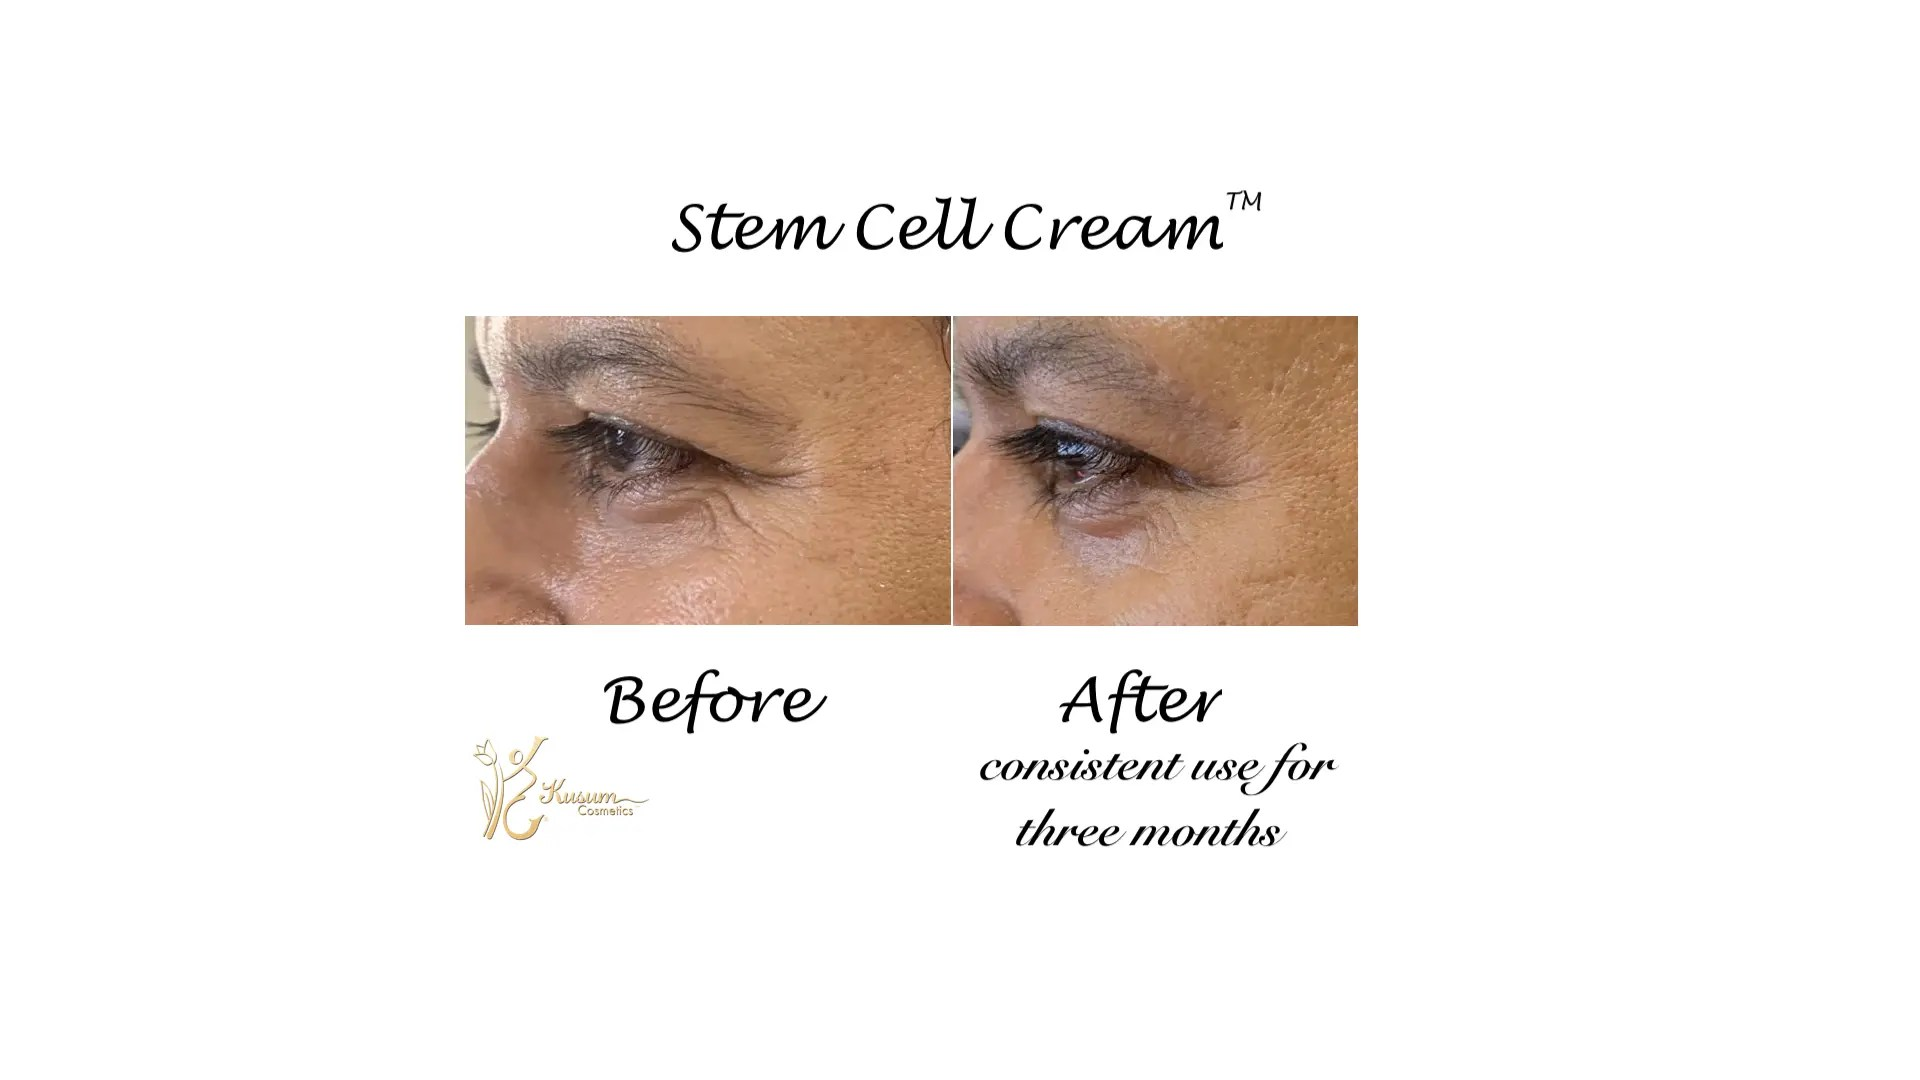 Stem Cell Cream Results